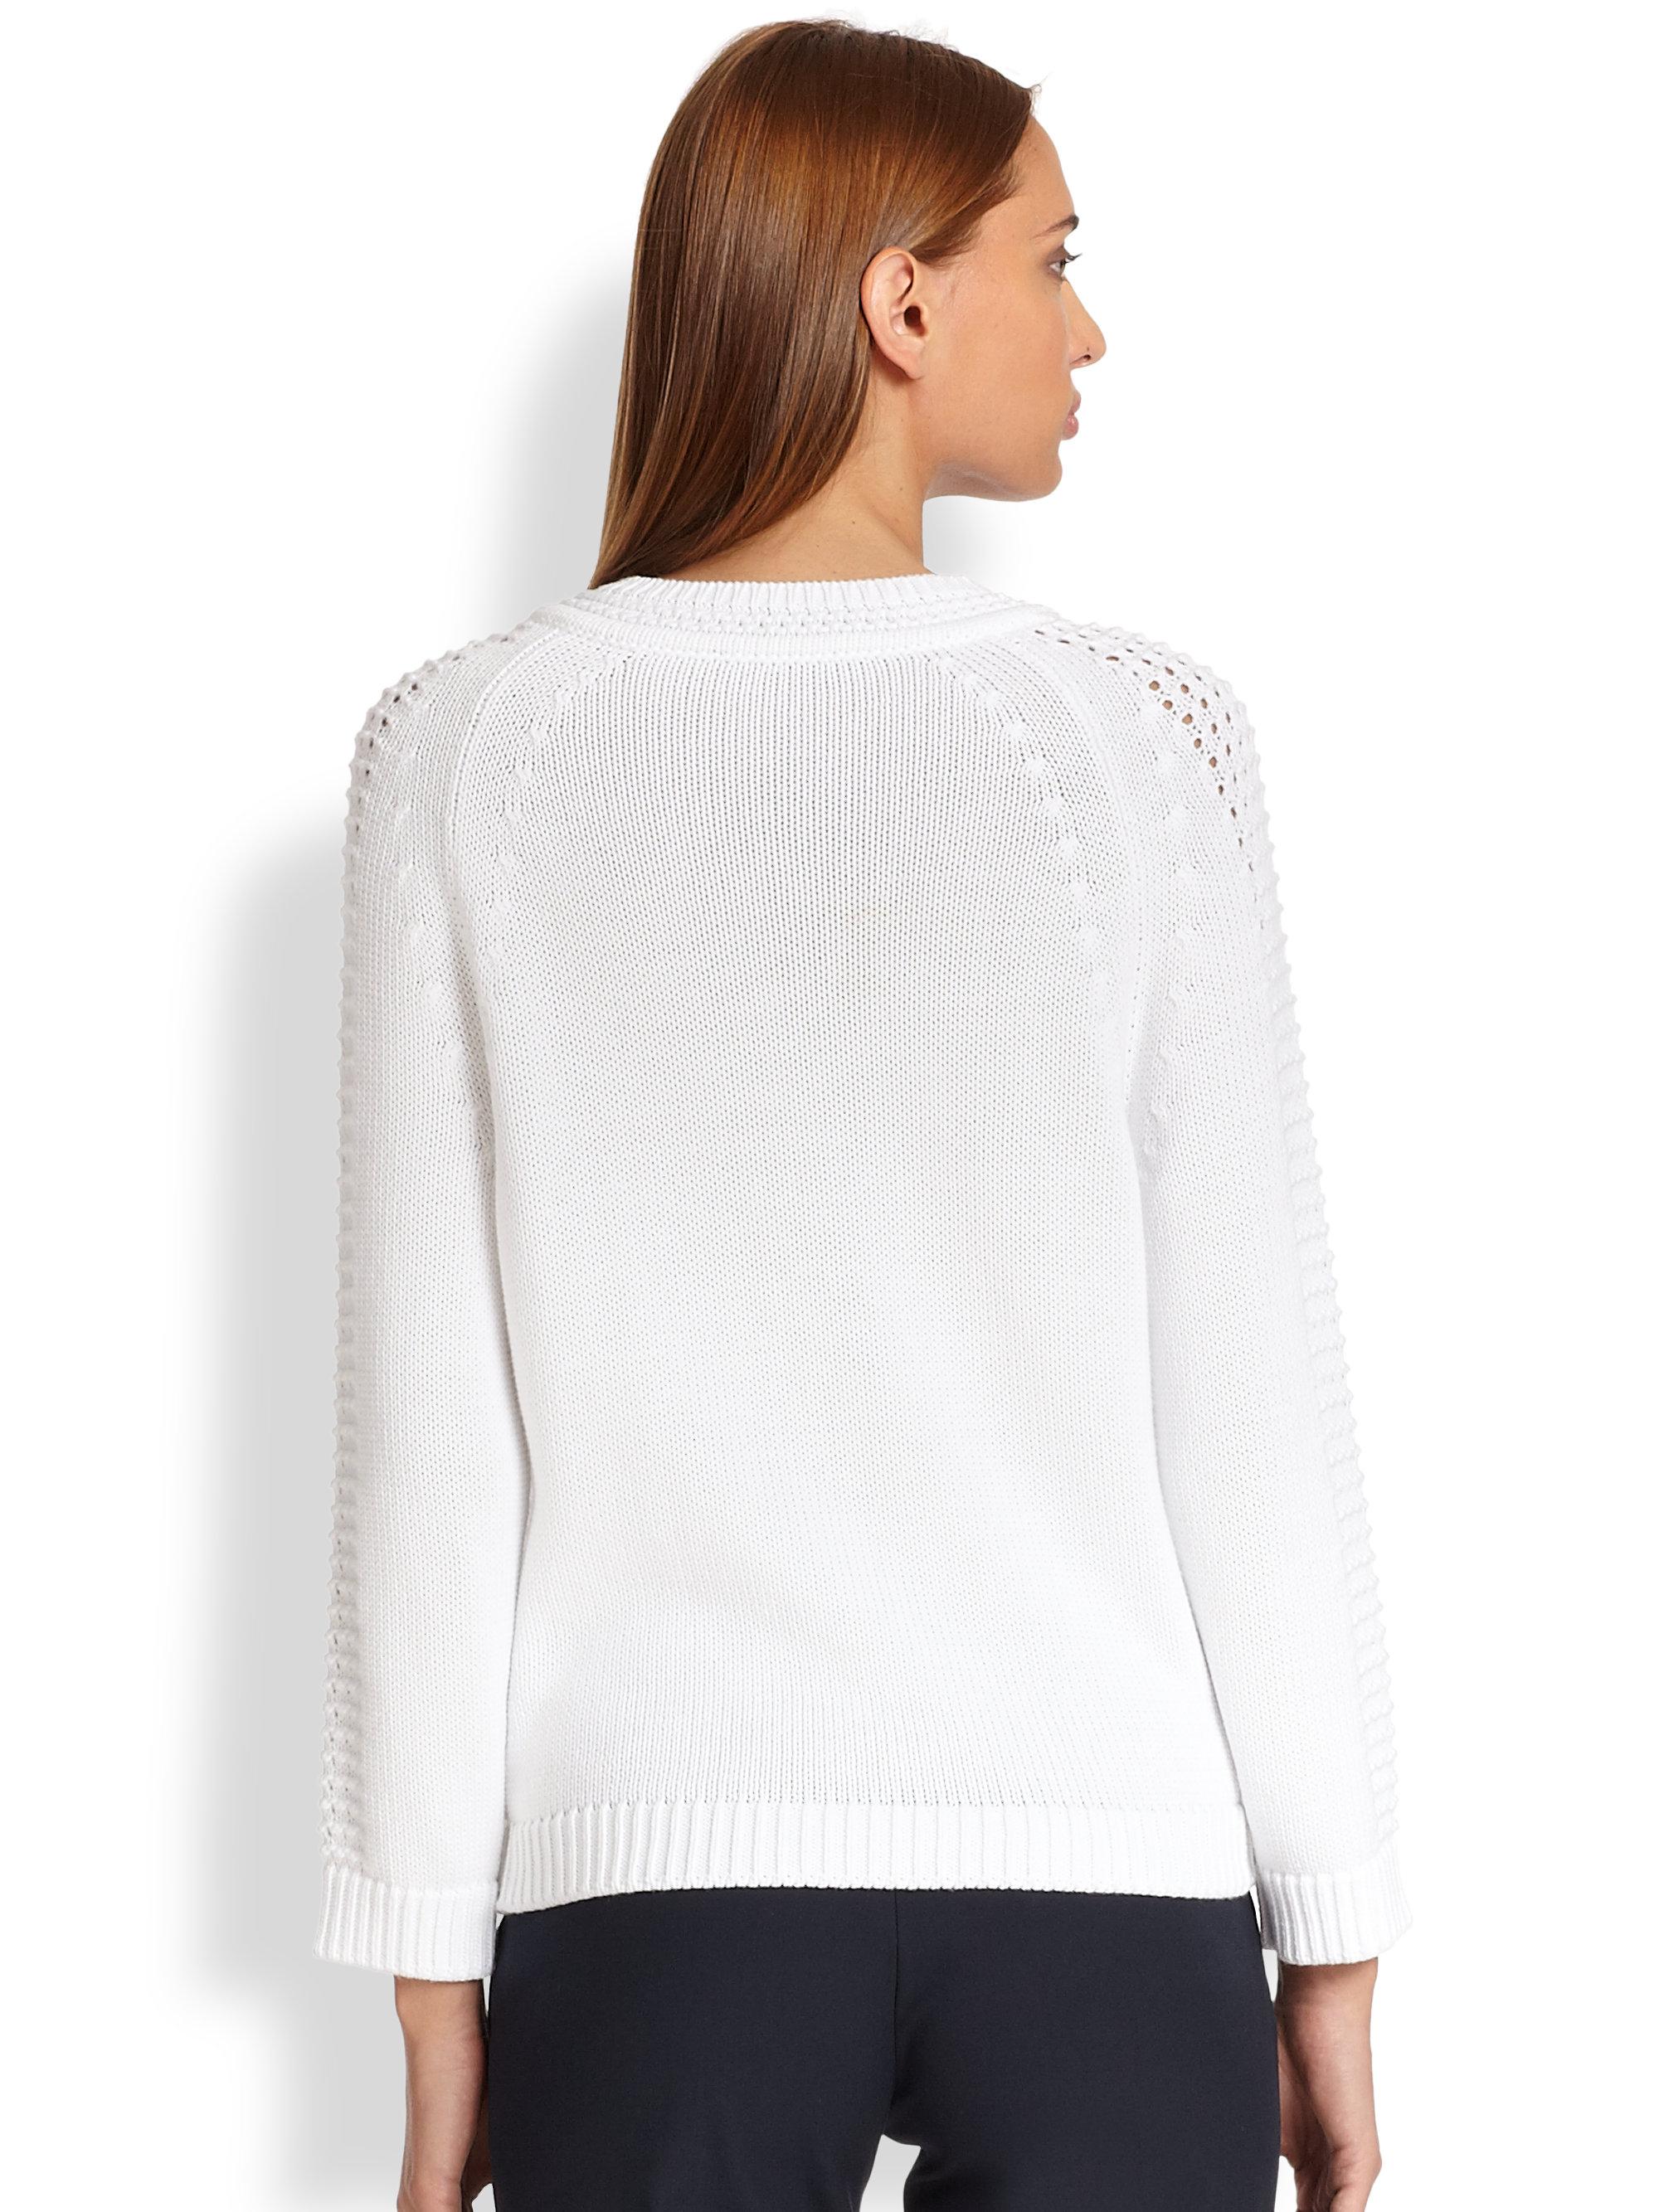 Reiss Sweater - Ava Metallic Cardigan in Grey/Silver (Gray